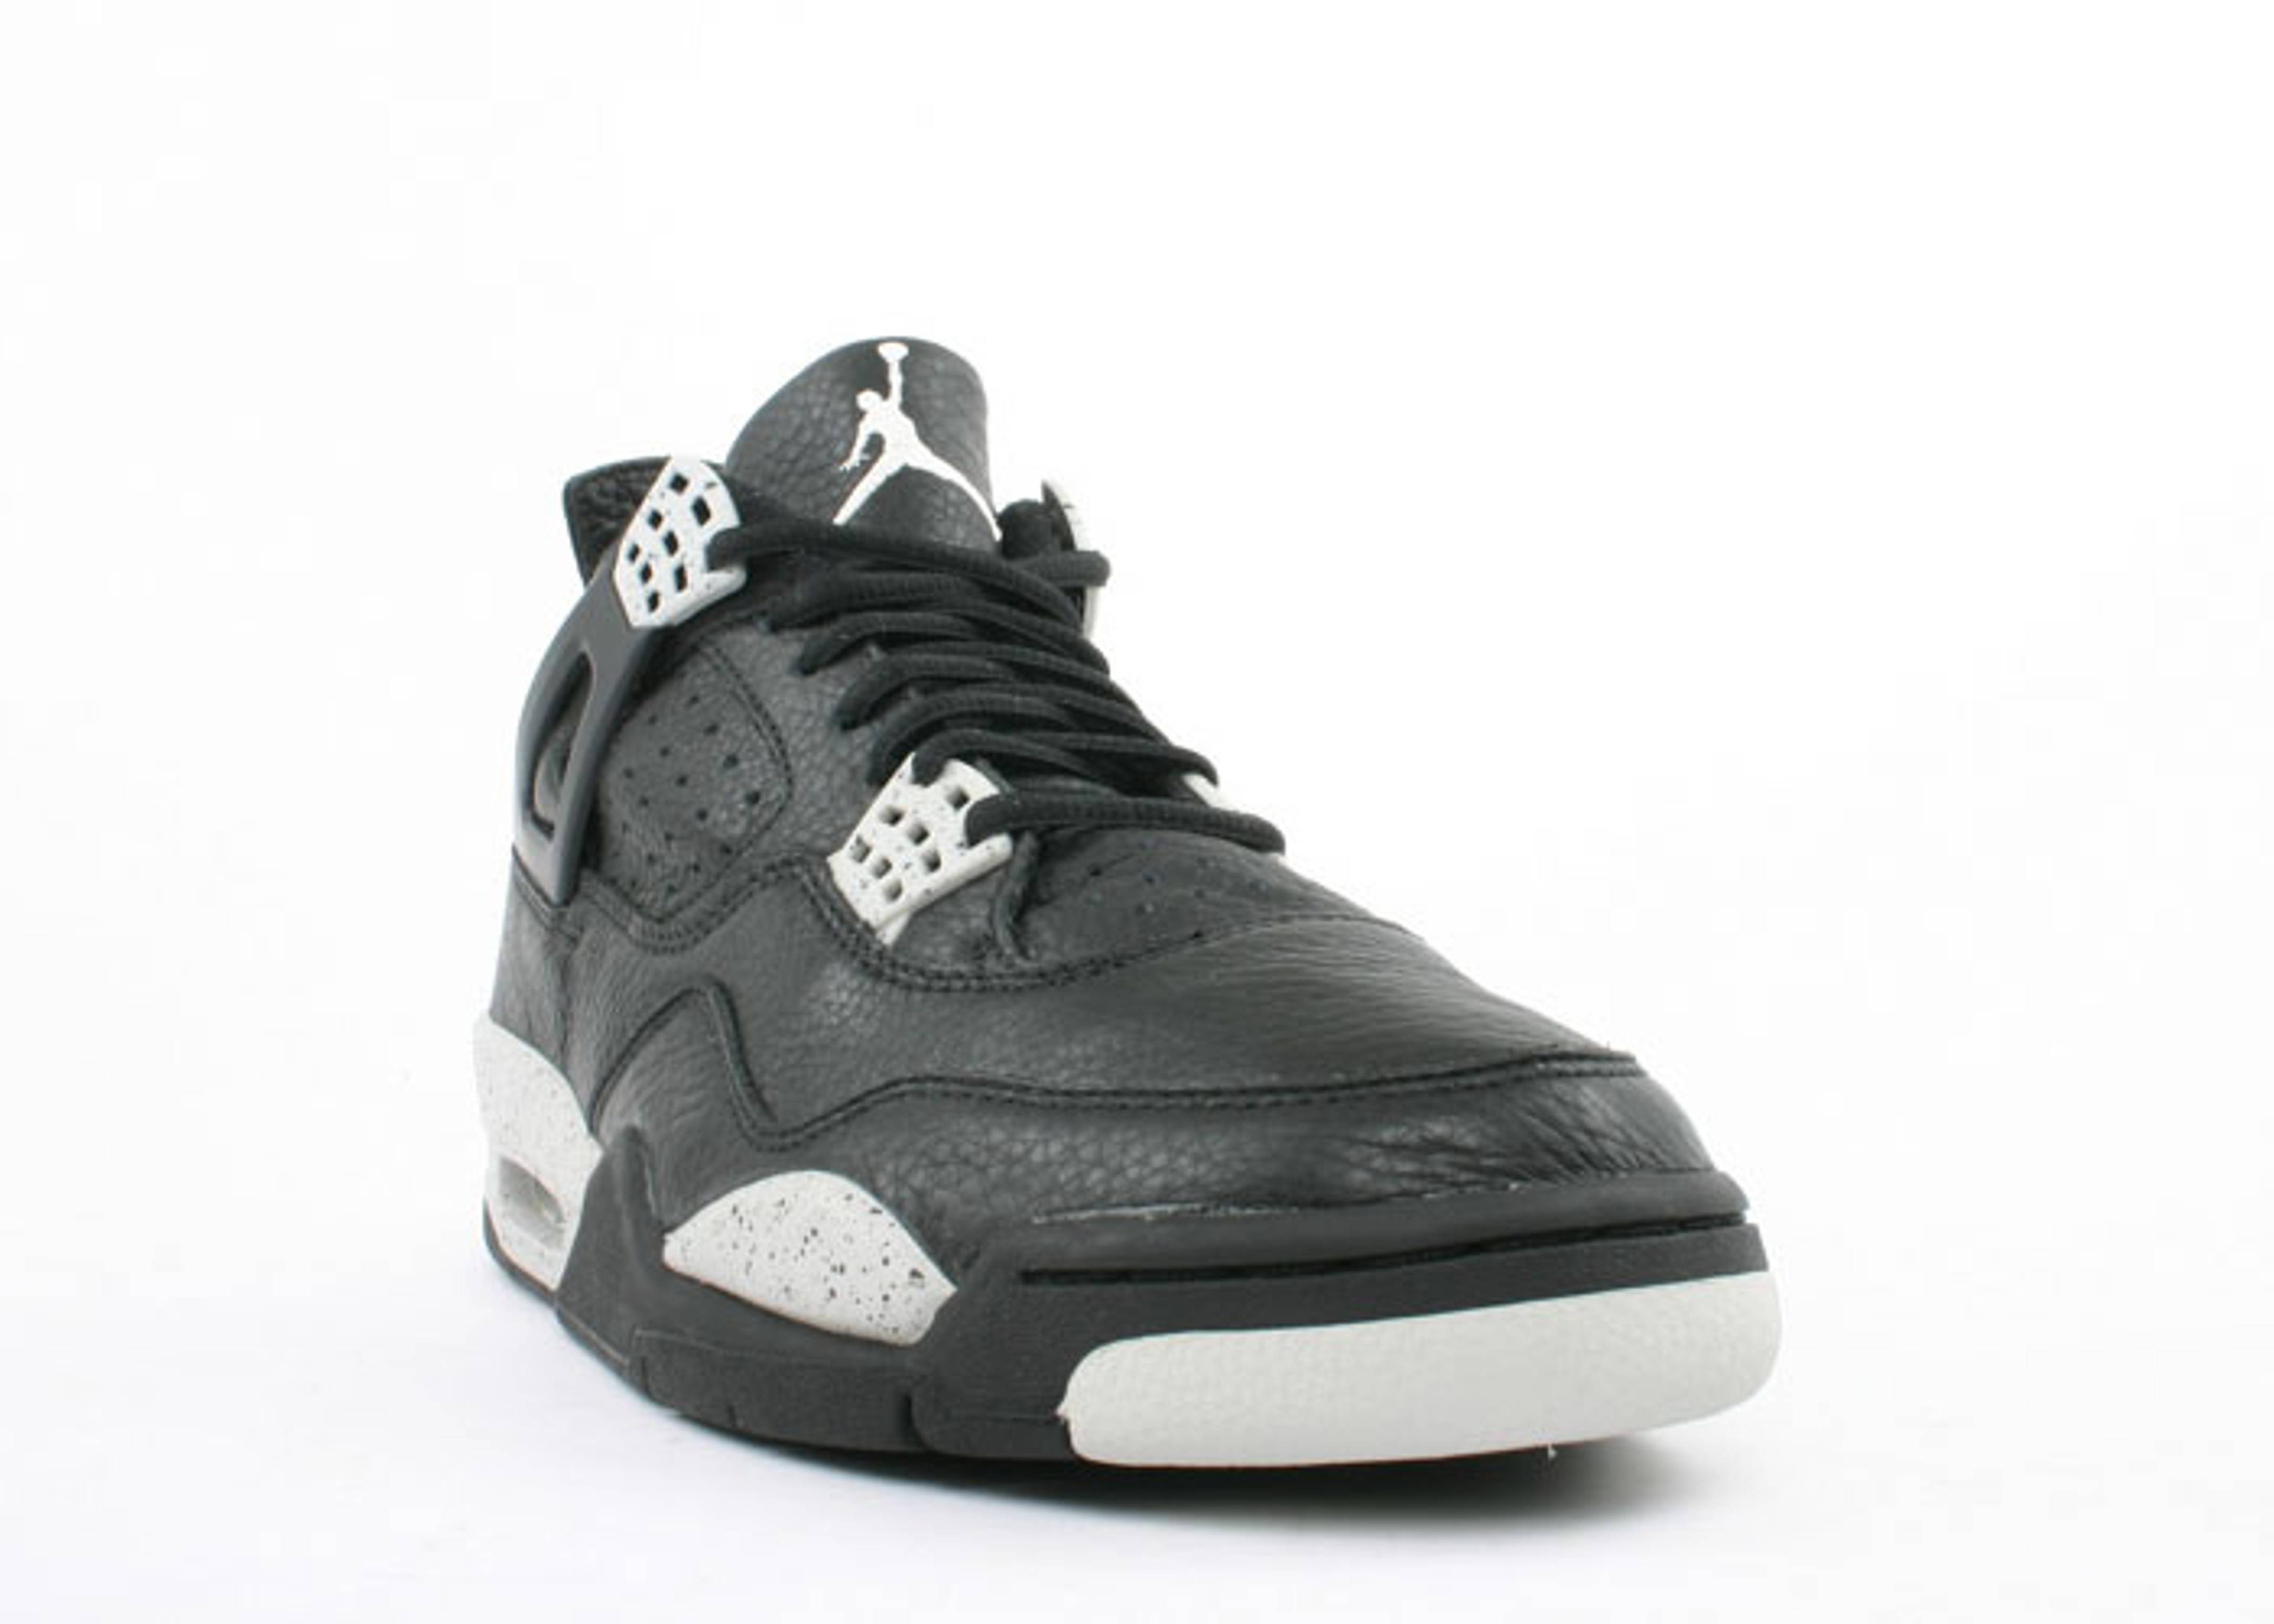 b467727eb479 Air Jordan 4 Retro + - Air Jordan - 136030 001 - black black-cool grey